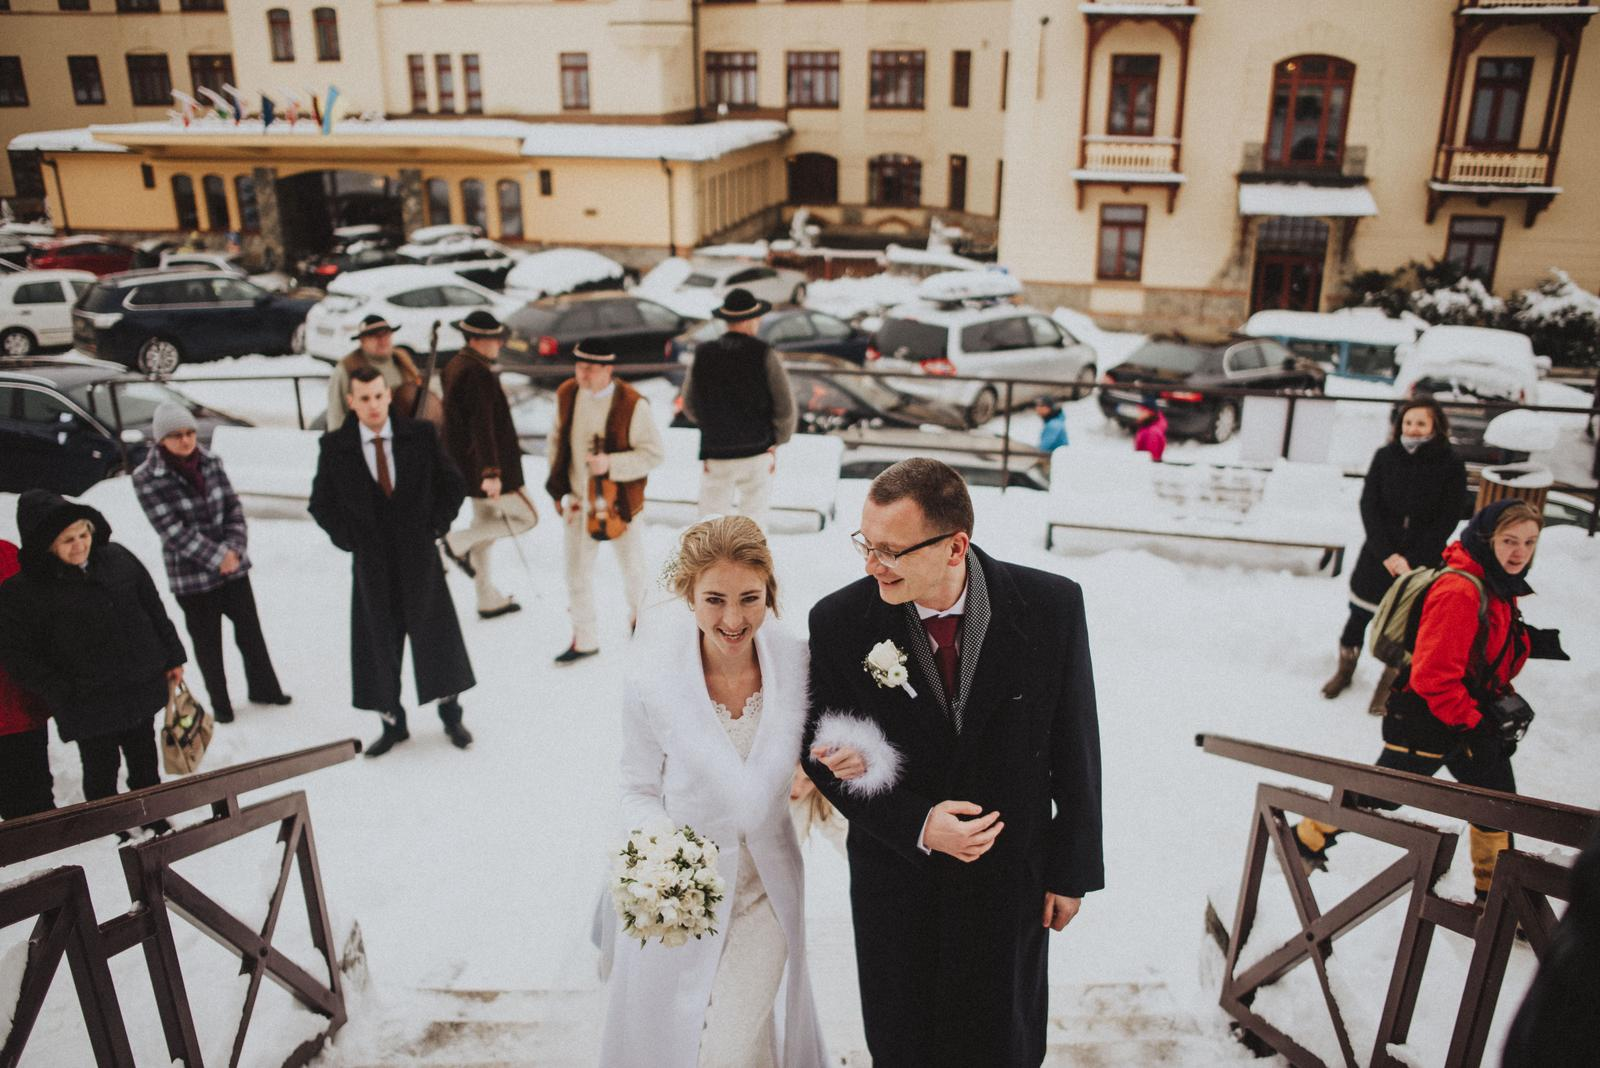 Tatranská zimná svadba - Starý Smokovec, starý kostolík